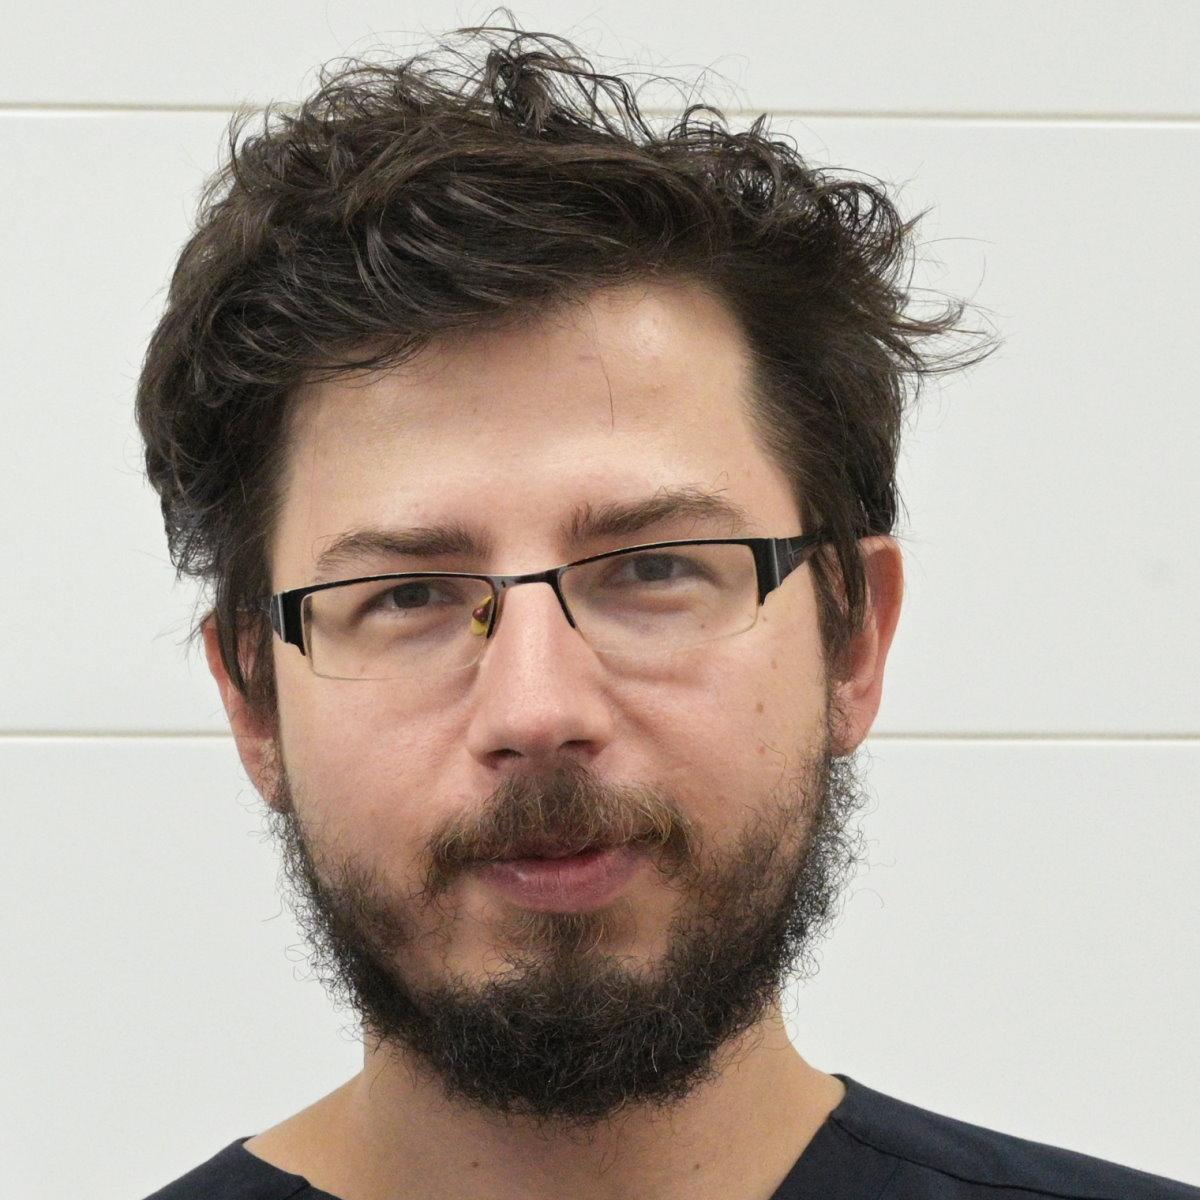 vet-point-Lek.wet.Piotr Radziszewski